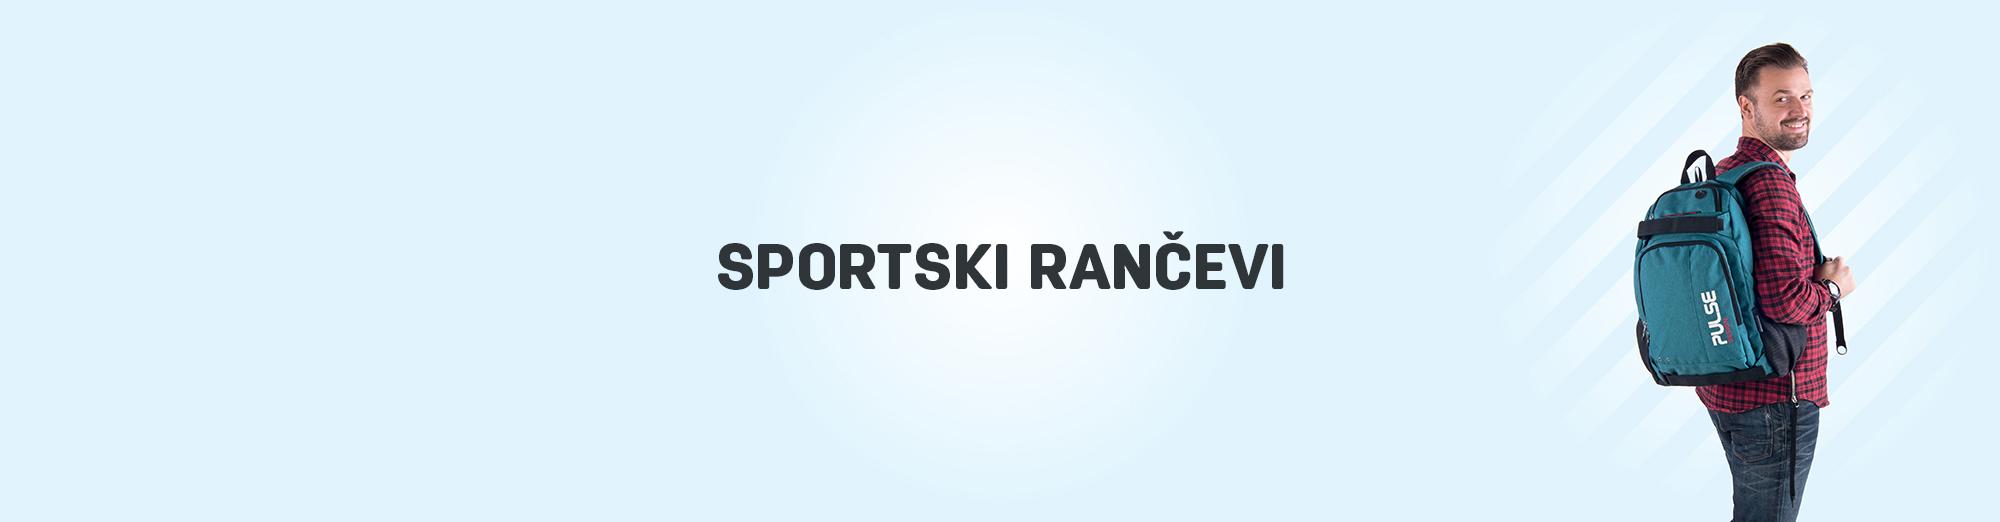 Sportski rančevi